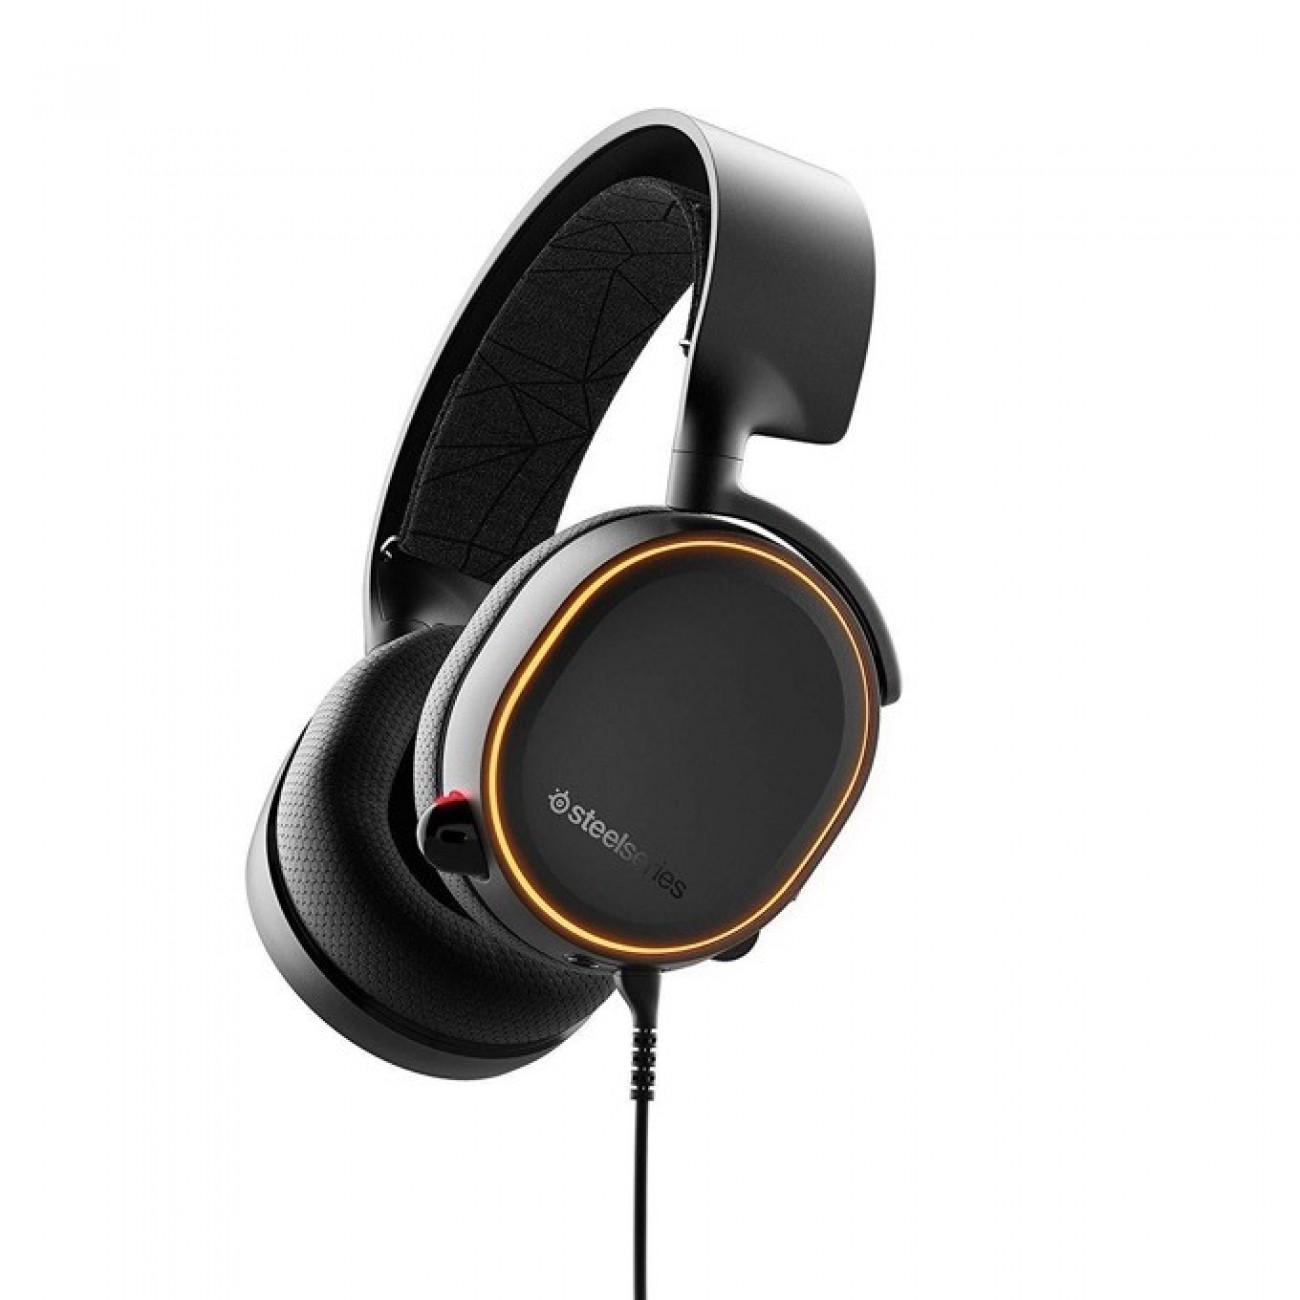 Слушалки Steel Series ARCTIS 5 2019 Edition, гейминг, микрофон, контрол на звука, Prism RGB подсветка, черни в Слушалки - SteelSeries | Alleop